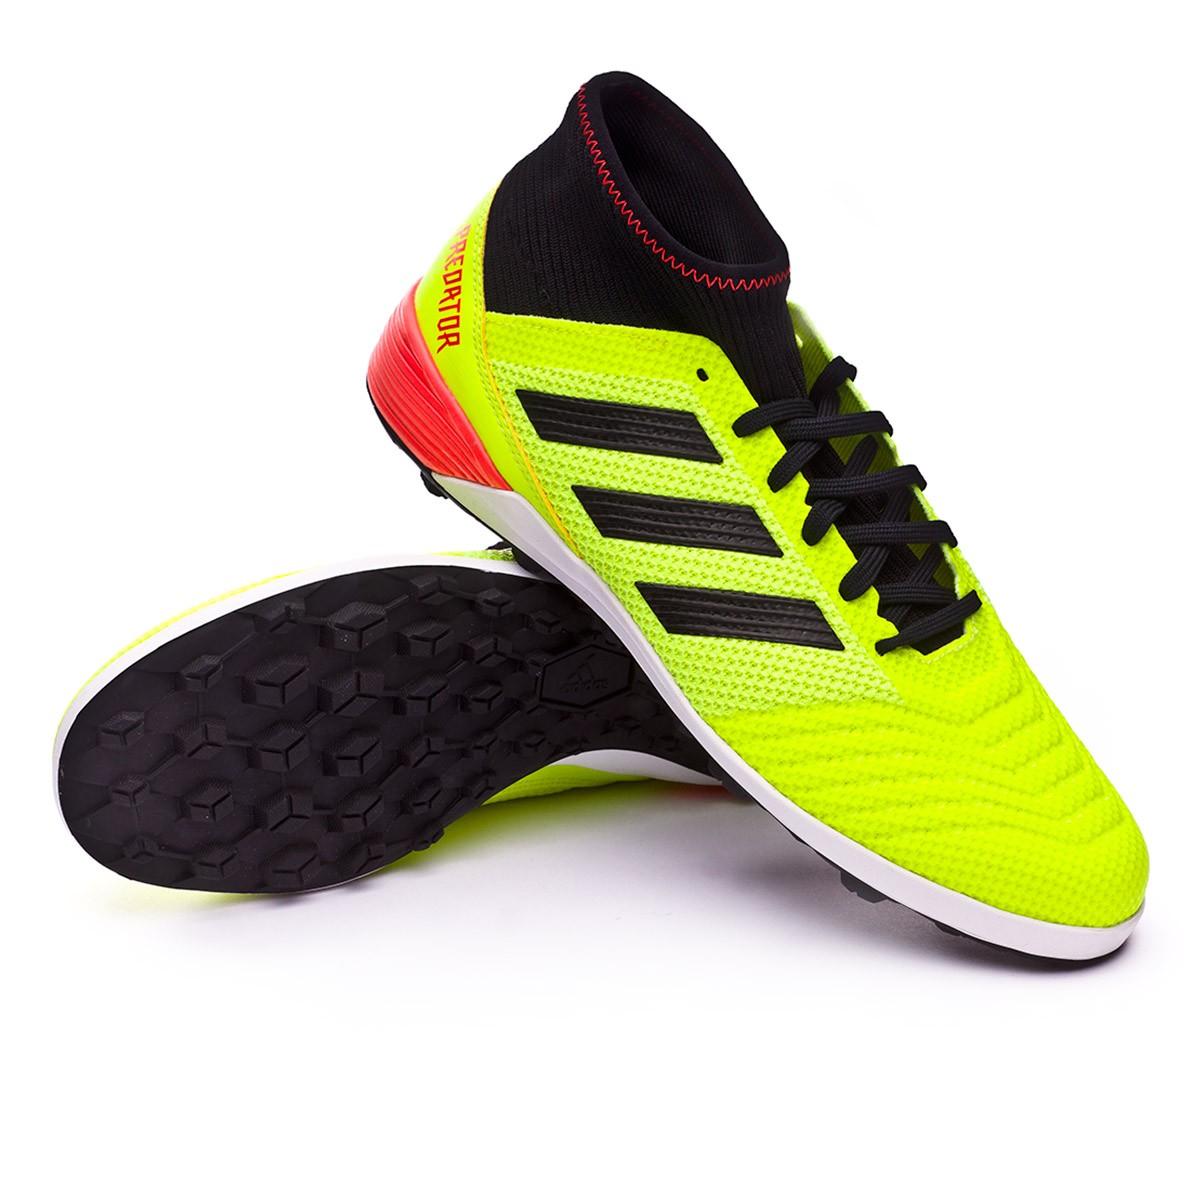 01915959542e Football Boot adidas Predator Tango 18.3 Turf Solar yellow-Black ...